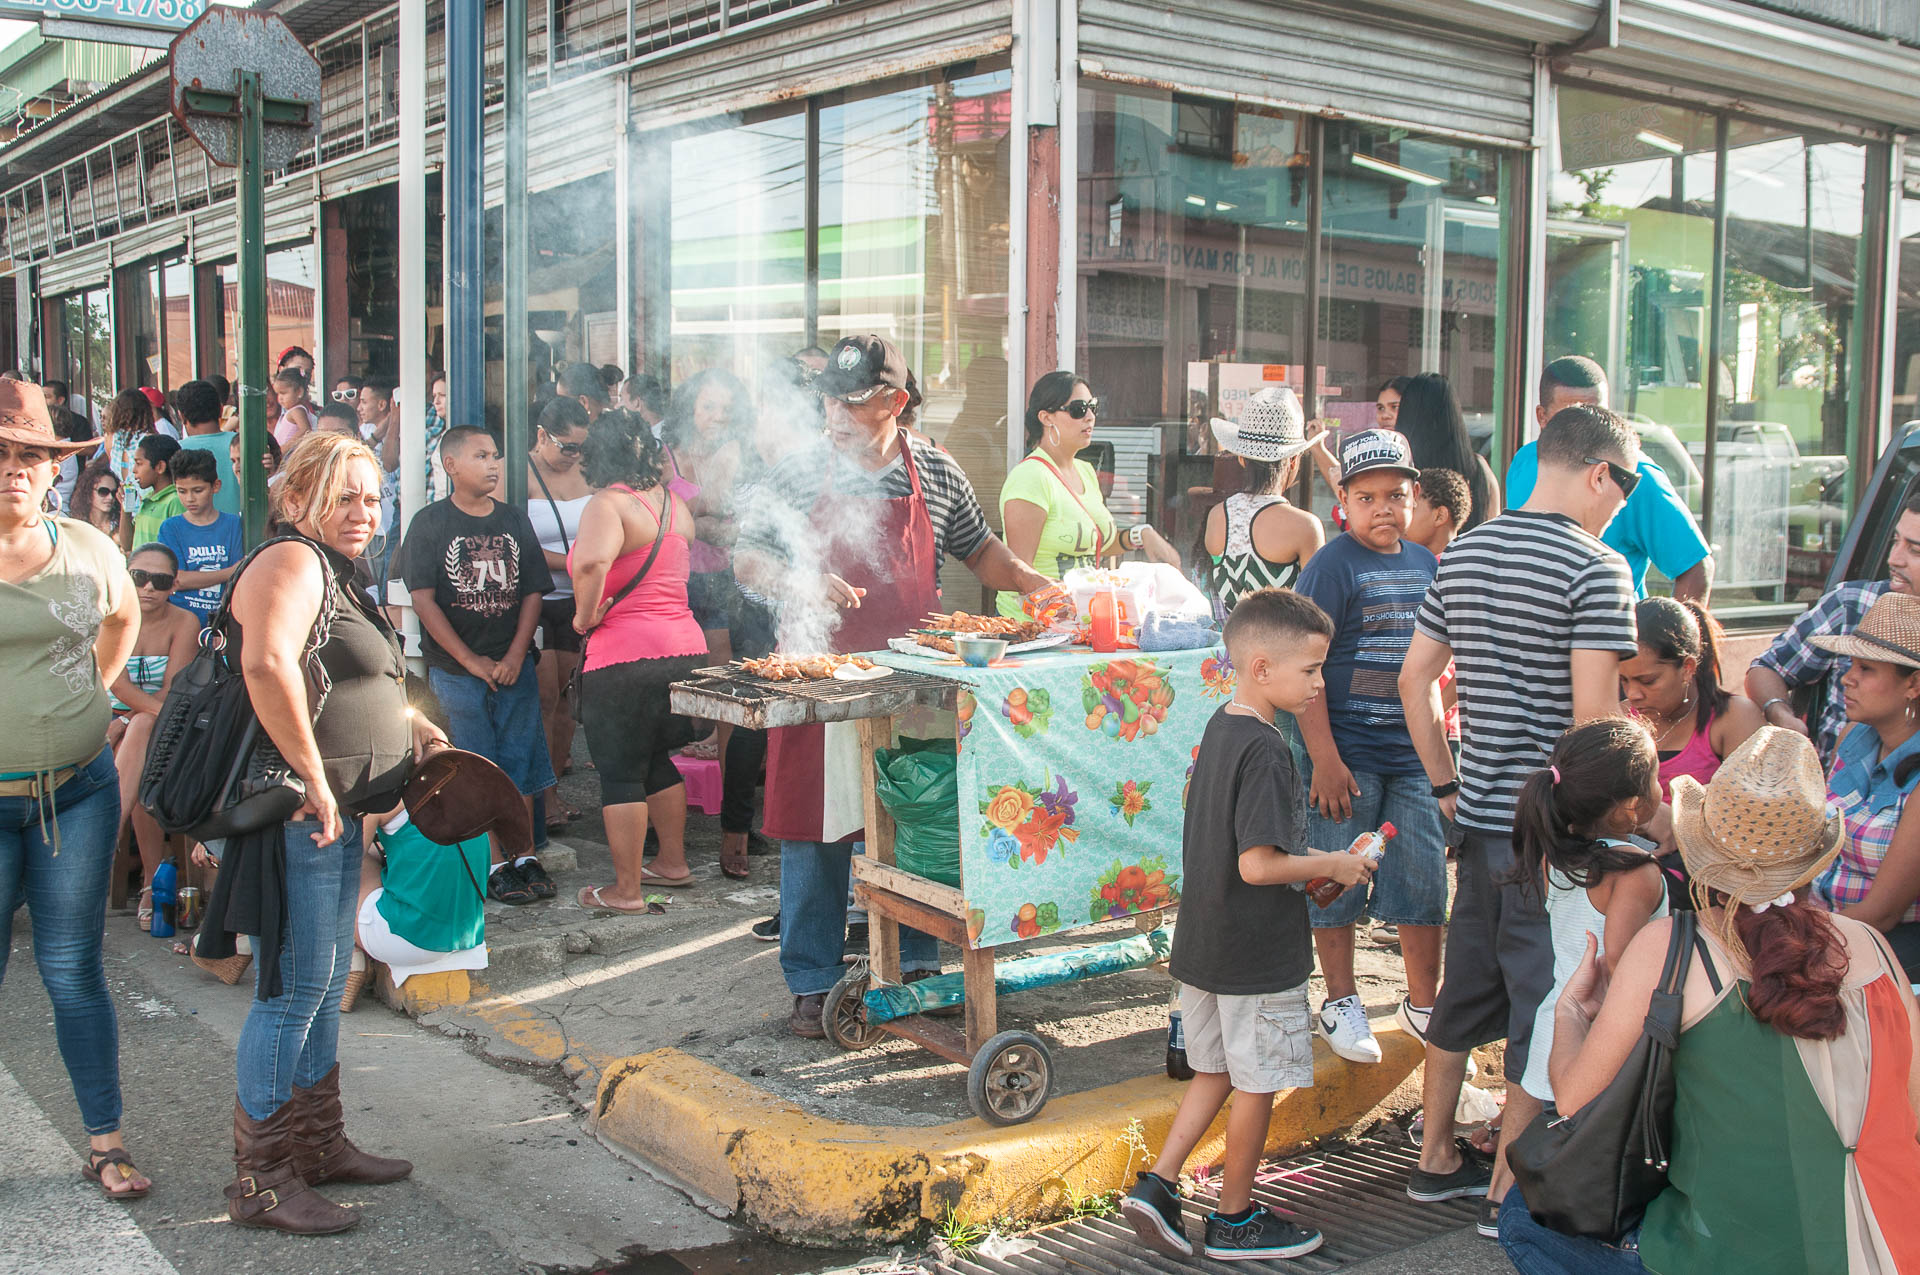 puerto limon barbecue - Les globe blogueurs - blog voyage nature